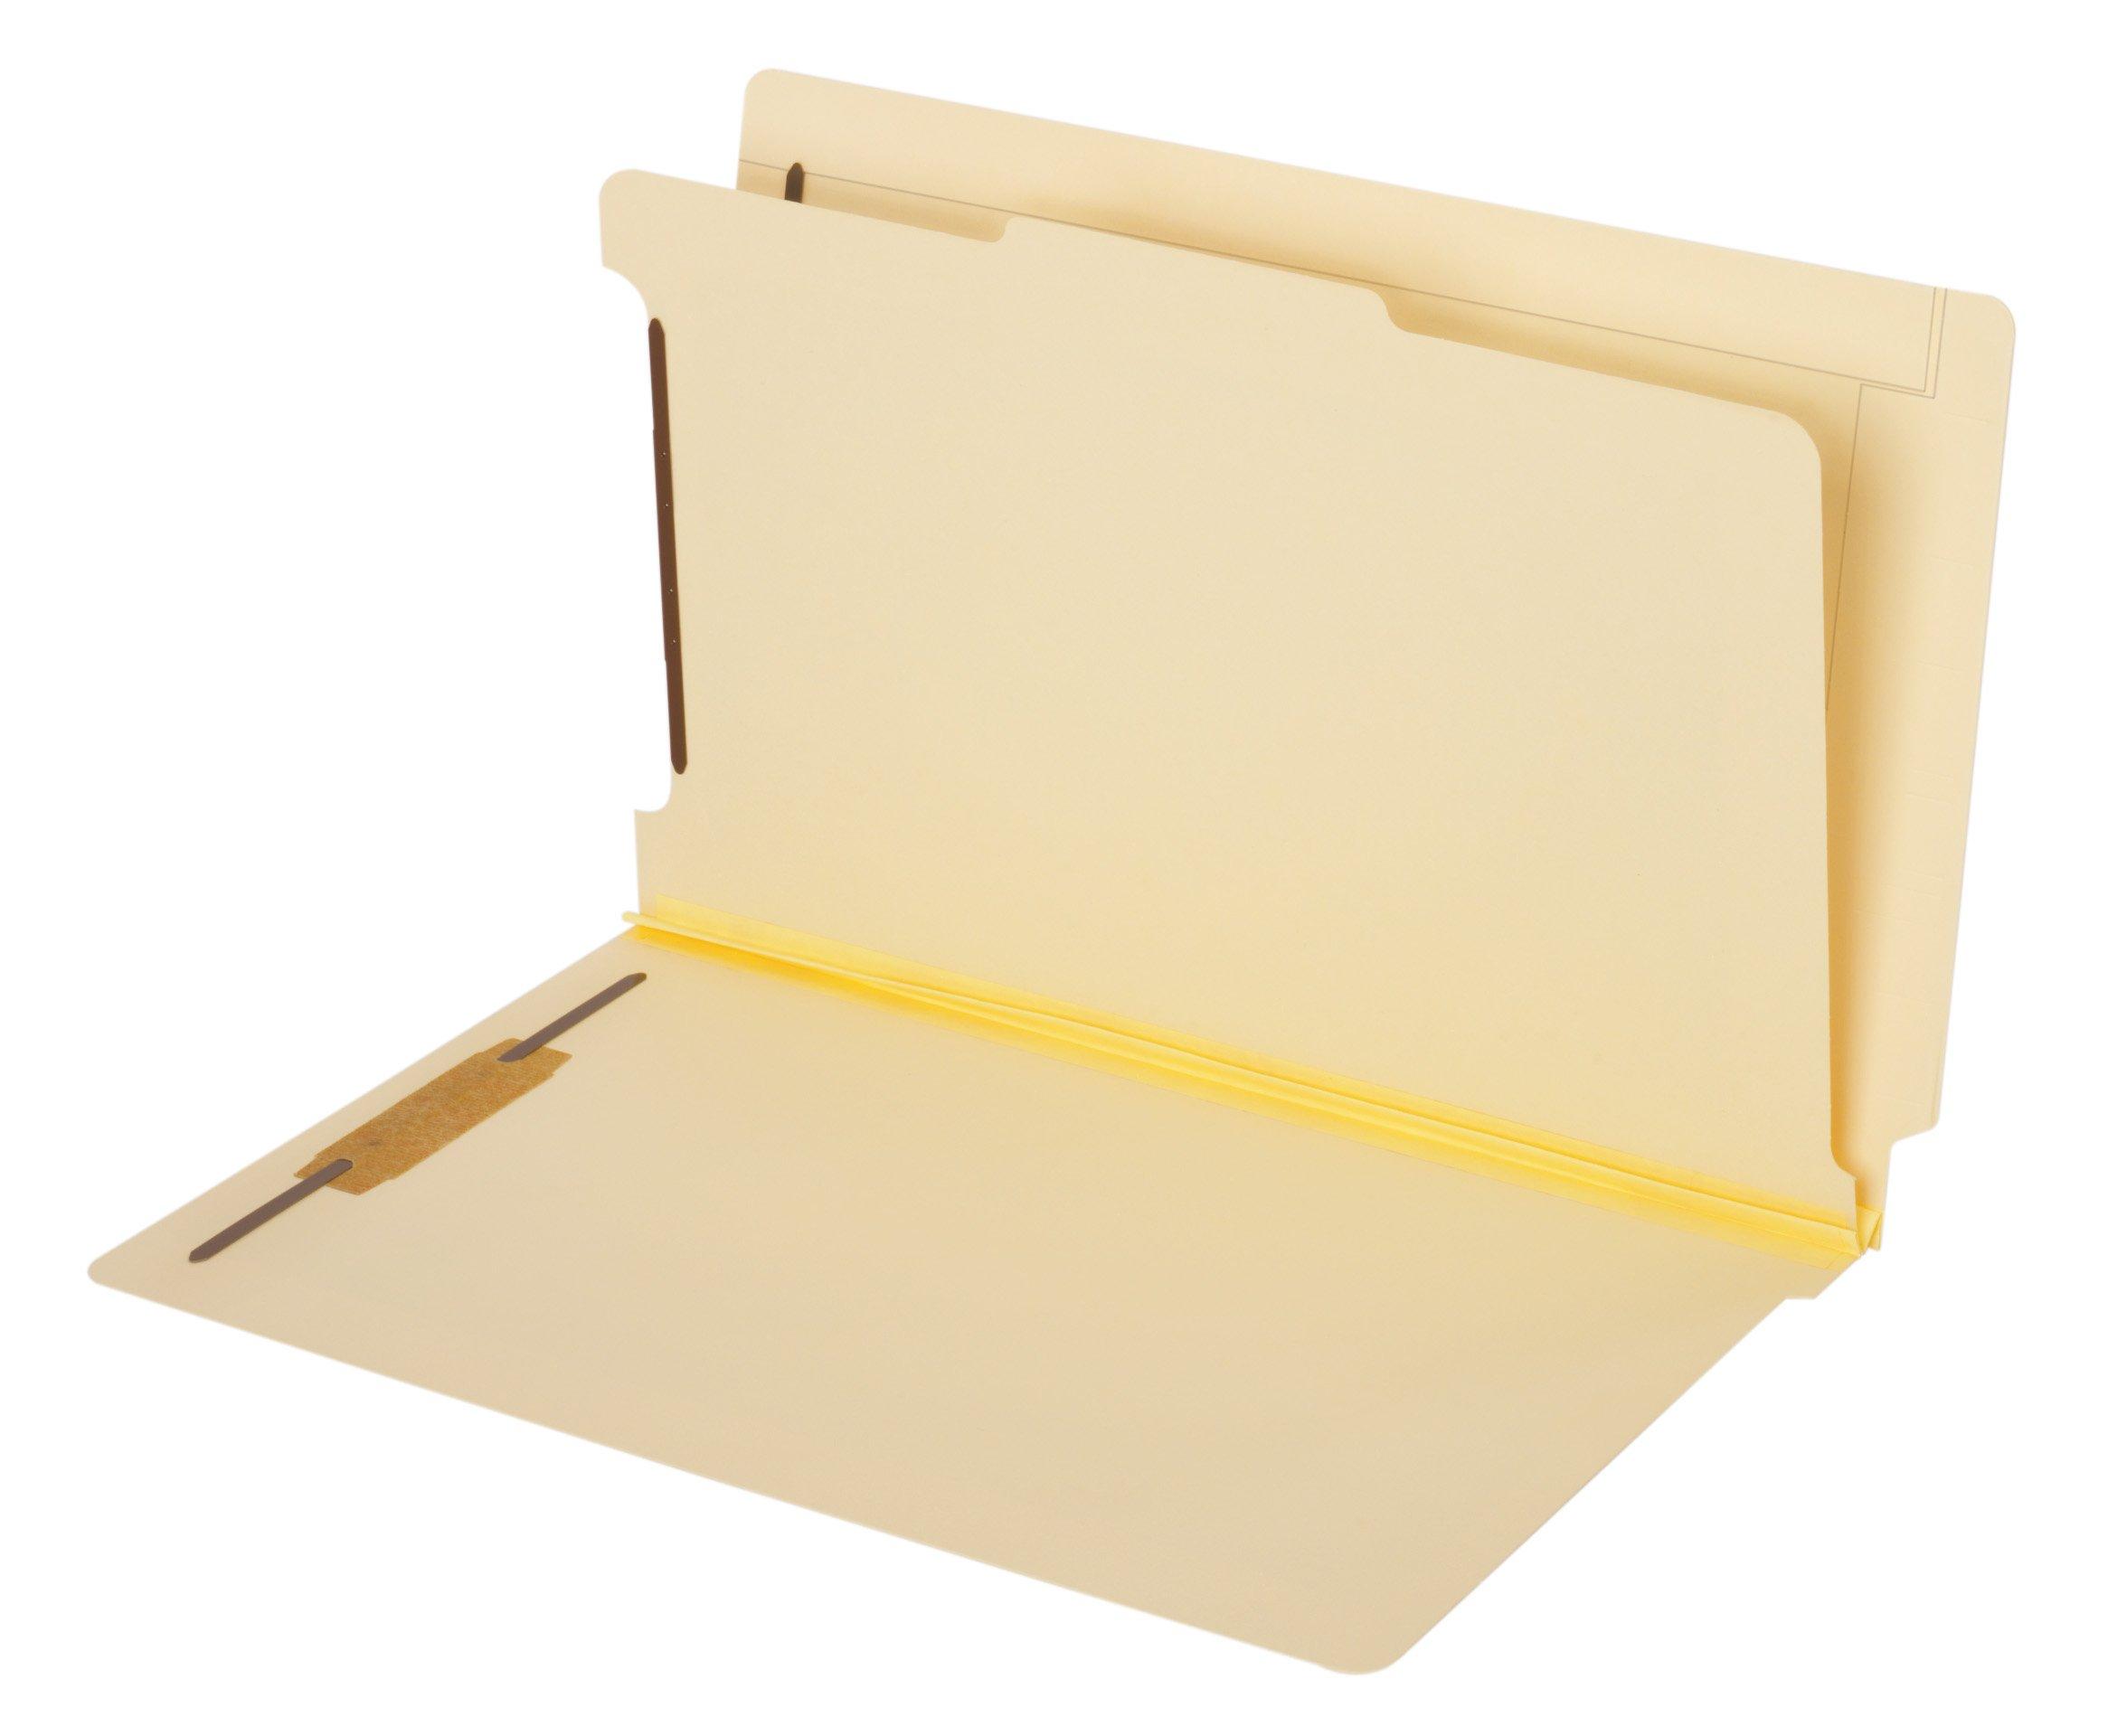 Globe-Weis/Pendaflex End Tab Classification Folders, 1 Divider, 2-Inch Bonded Fasteners, Legal Size, Manila, 10 Folders Per Box (39825)